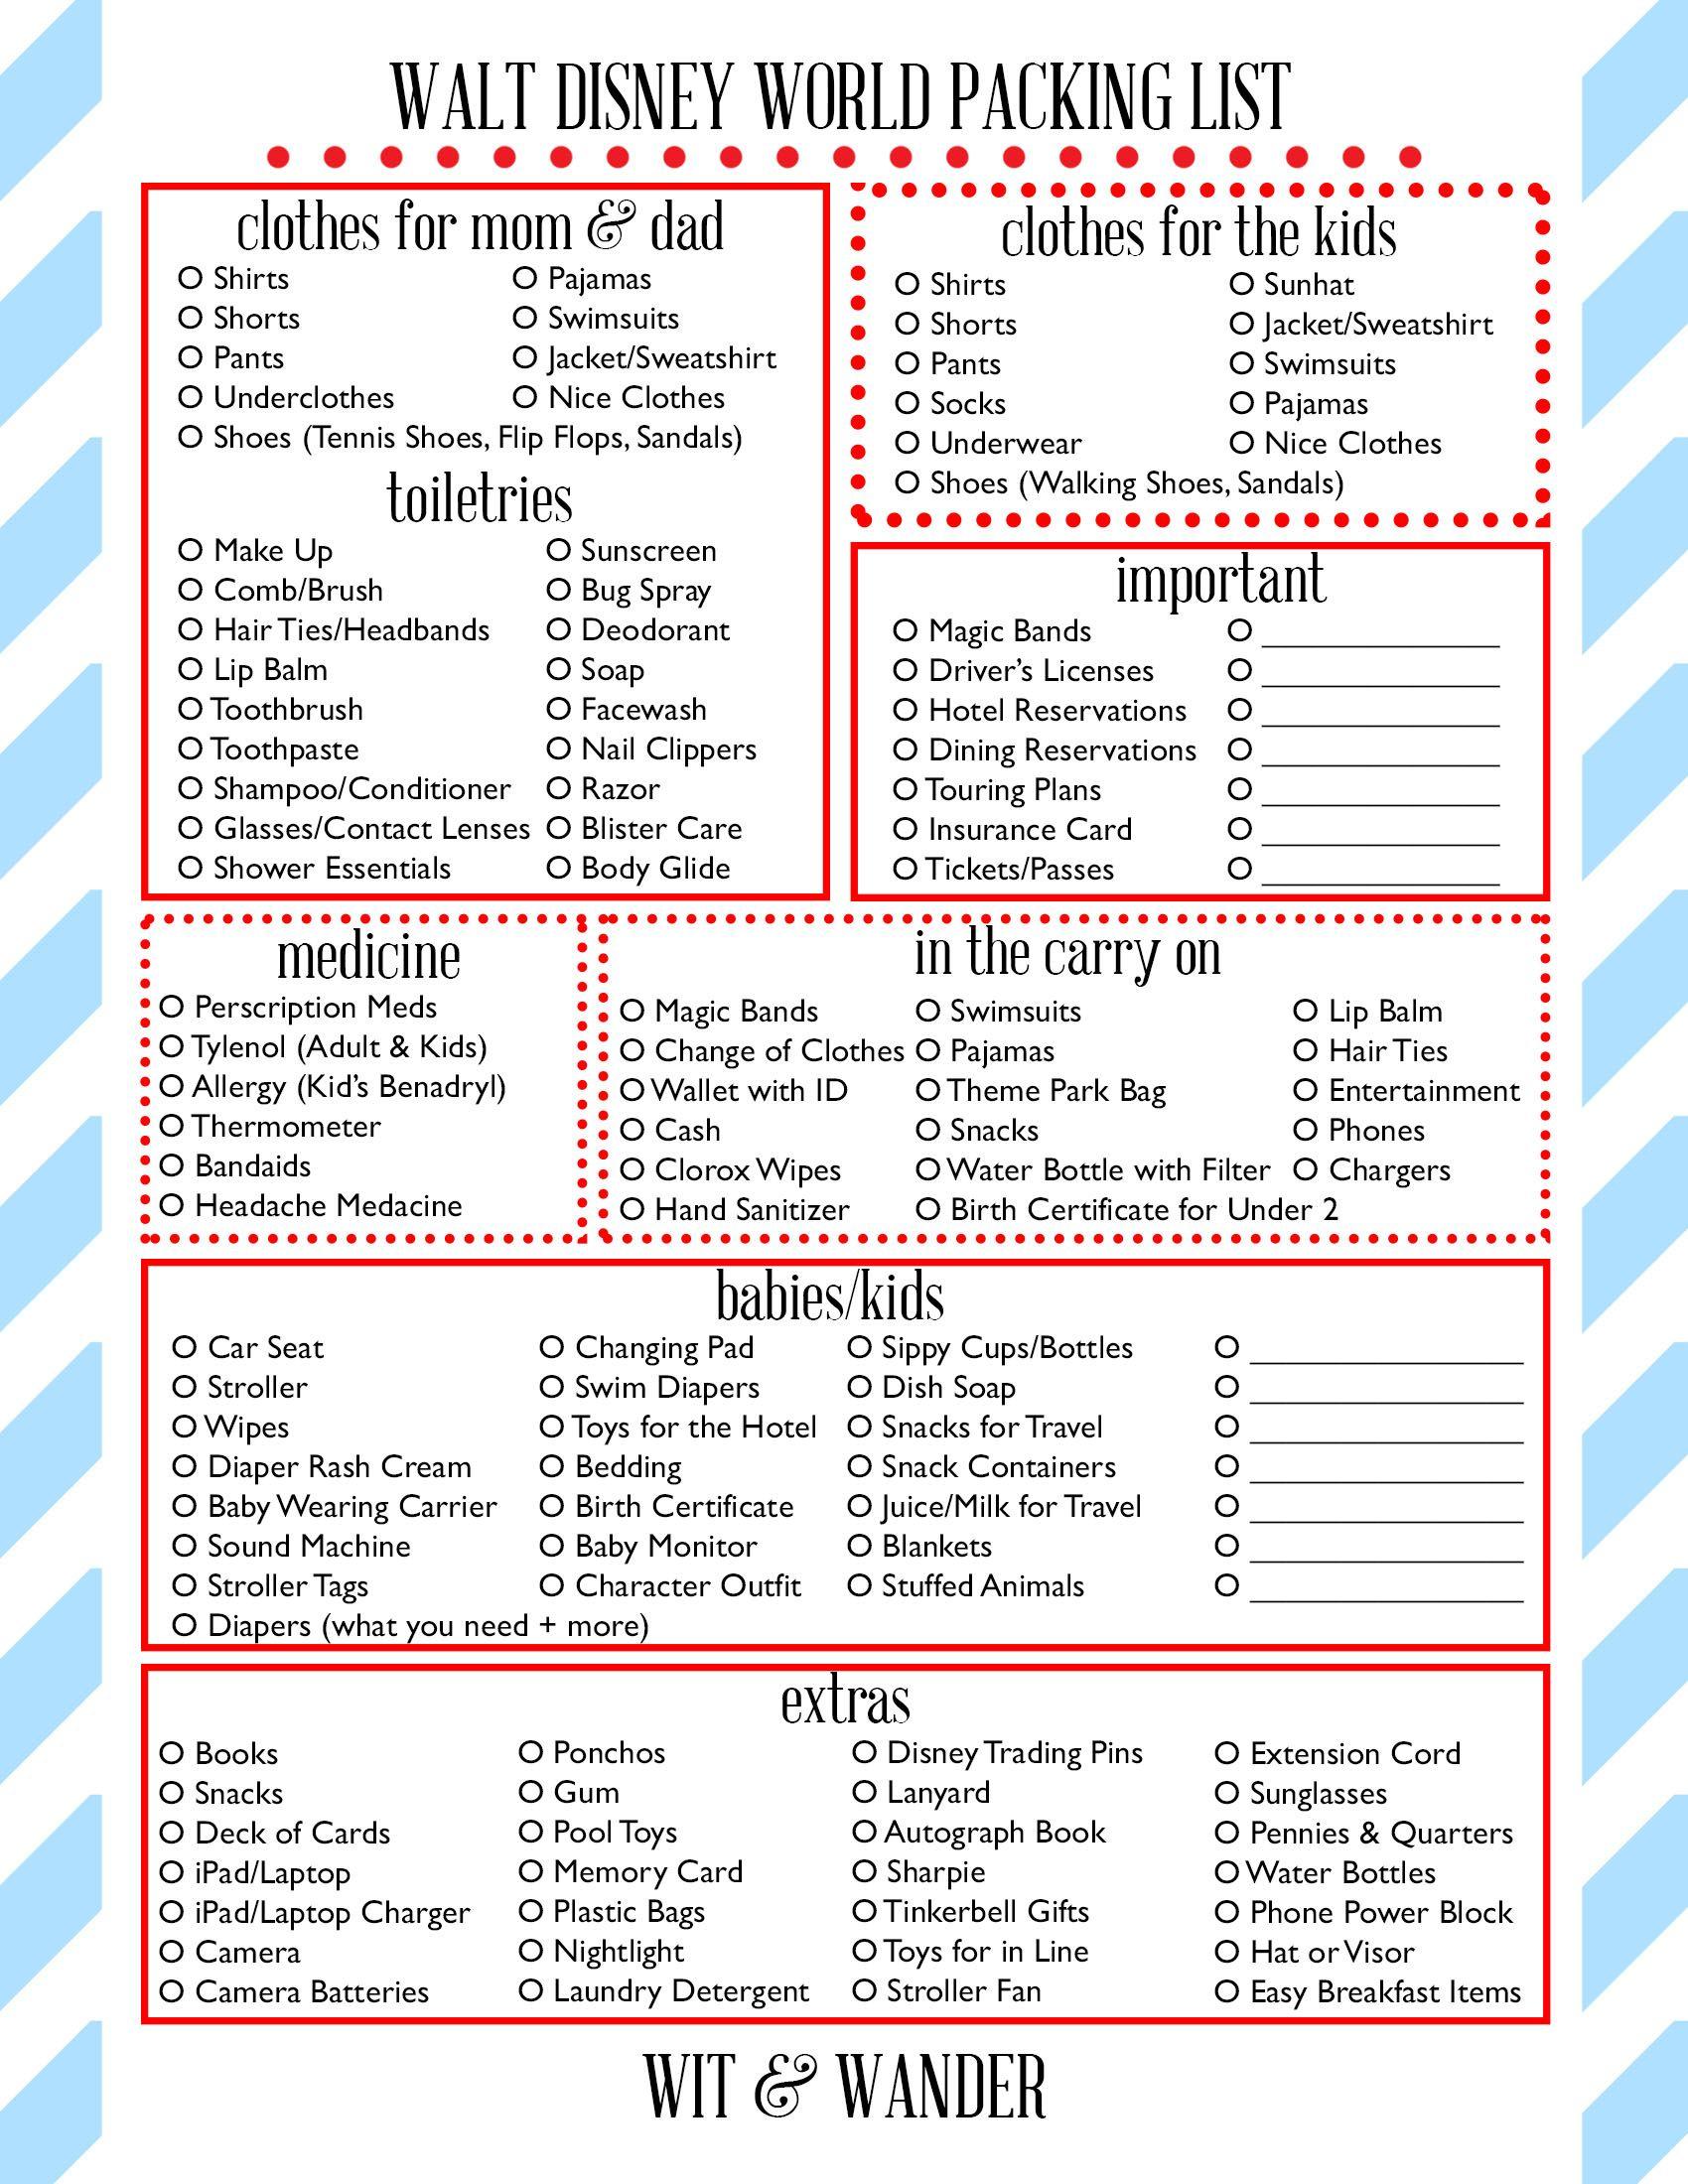 Walt Disney World Free Printables | Disney World Packing